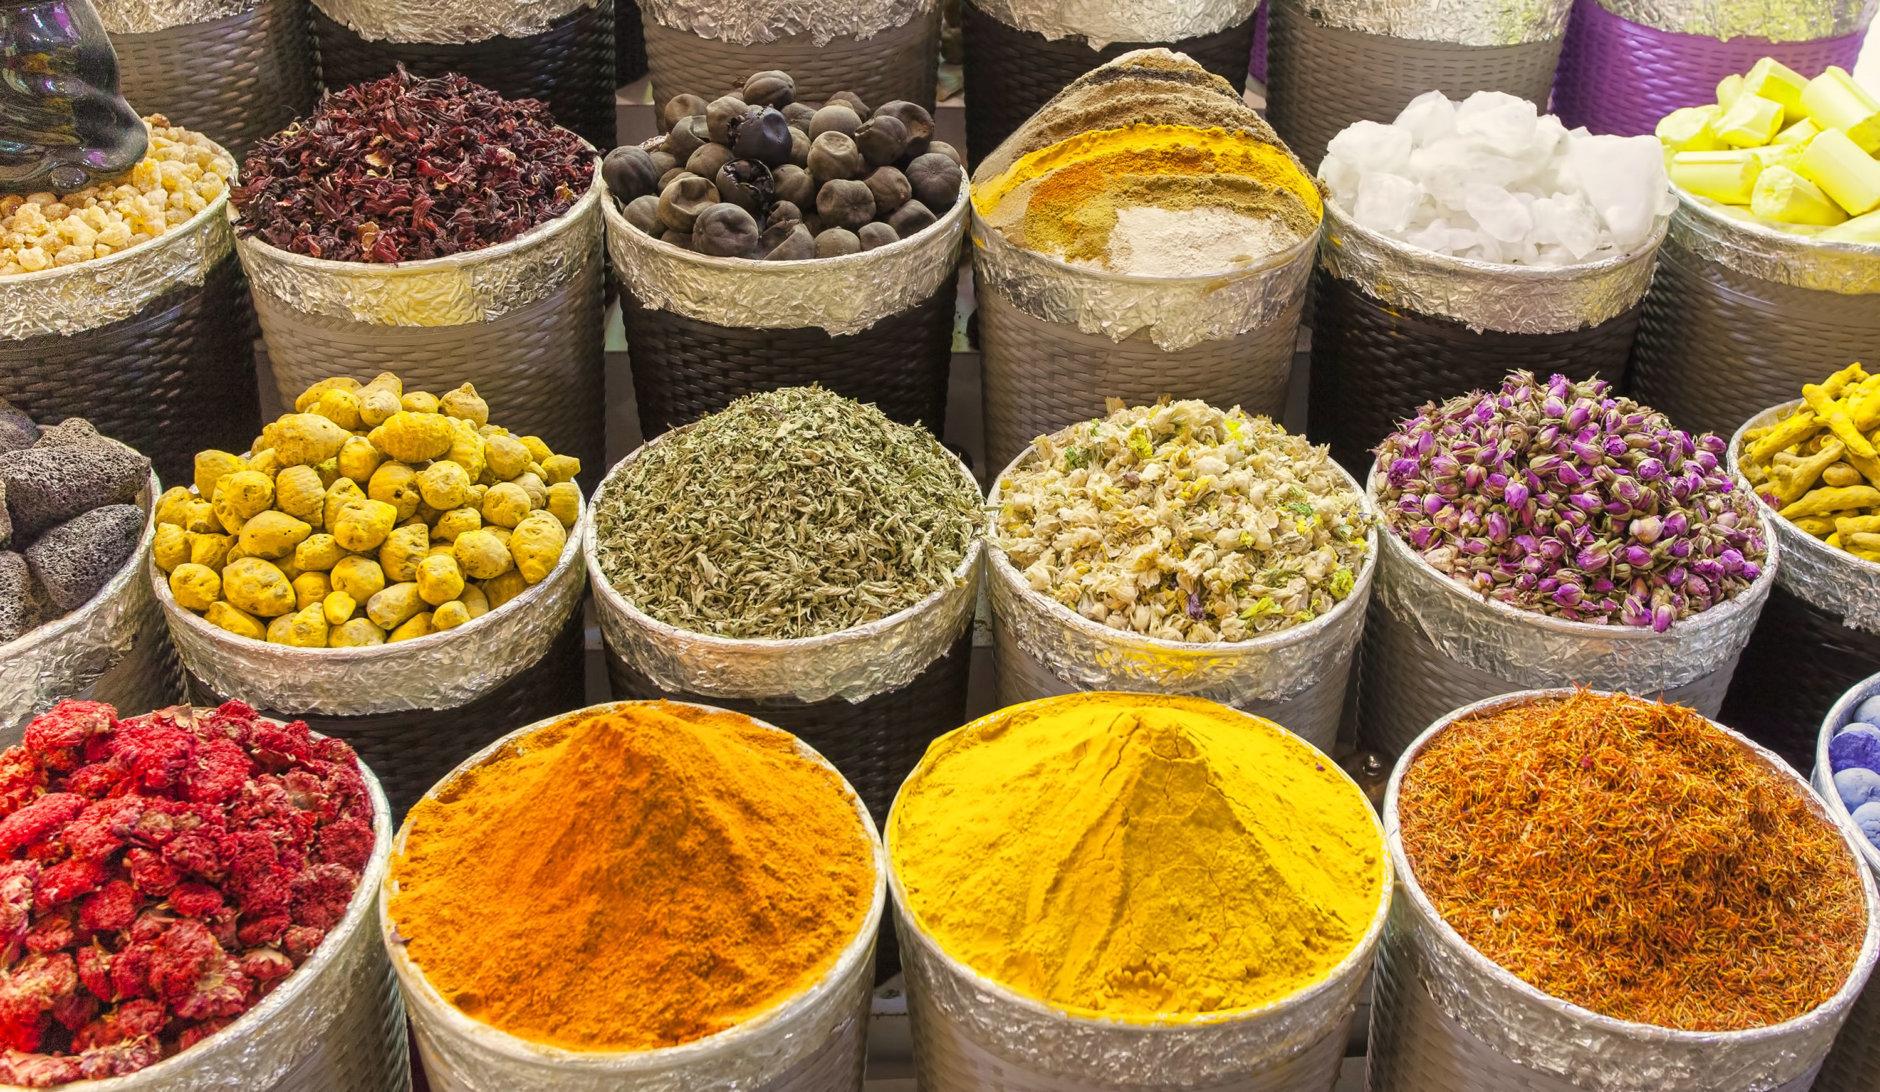 traditional spice market in United Arab Emirates, Dubai souk or market